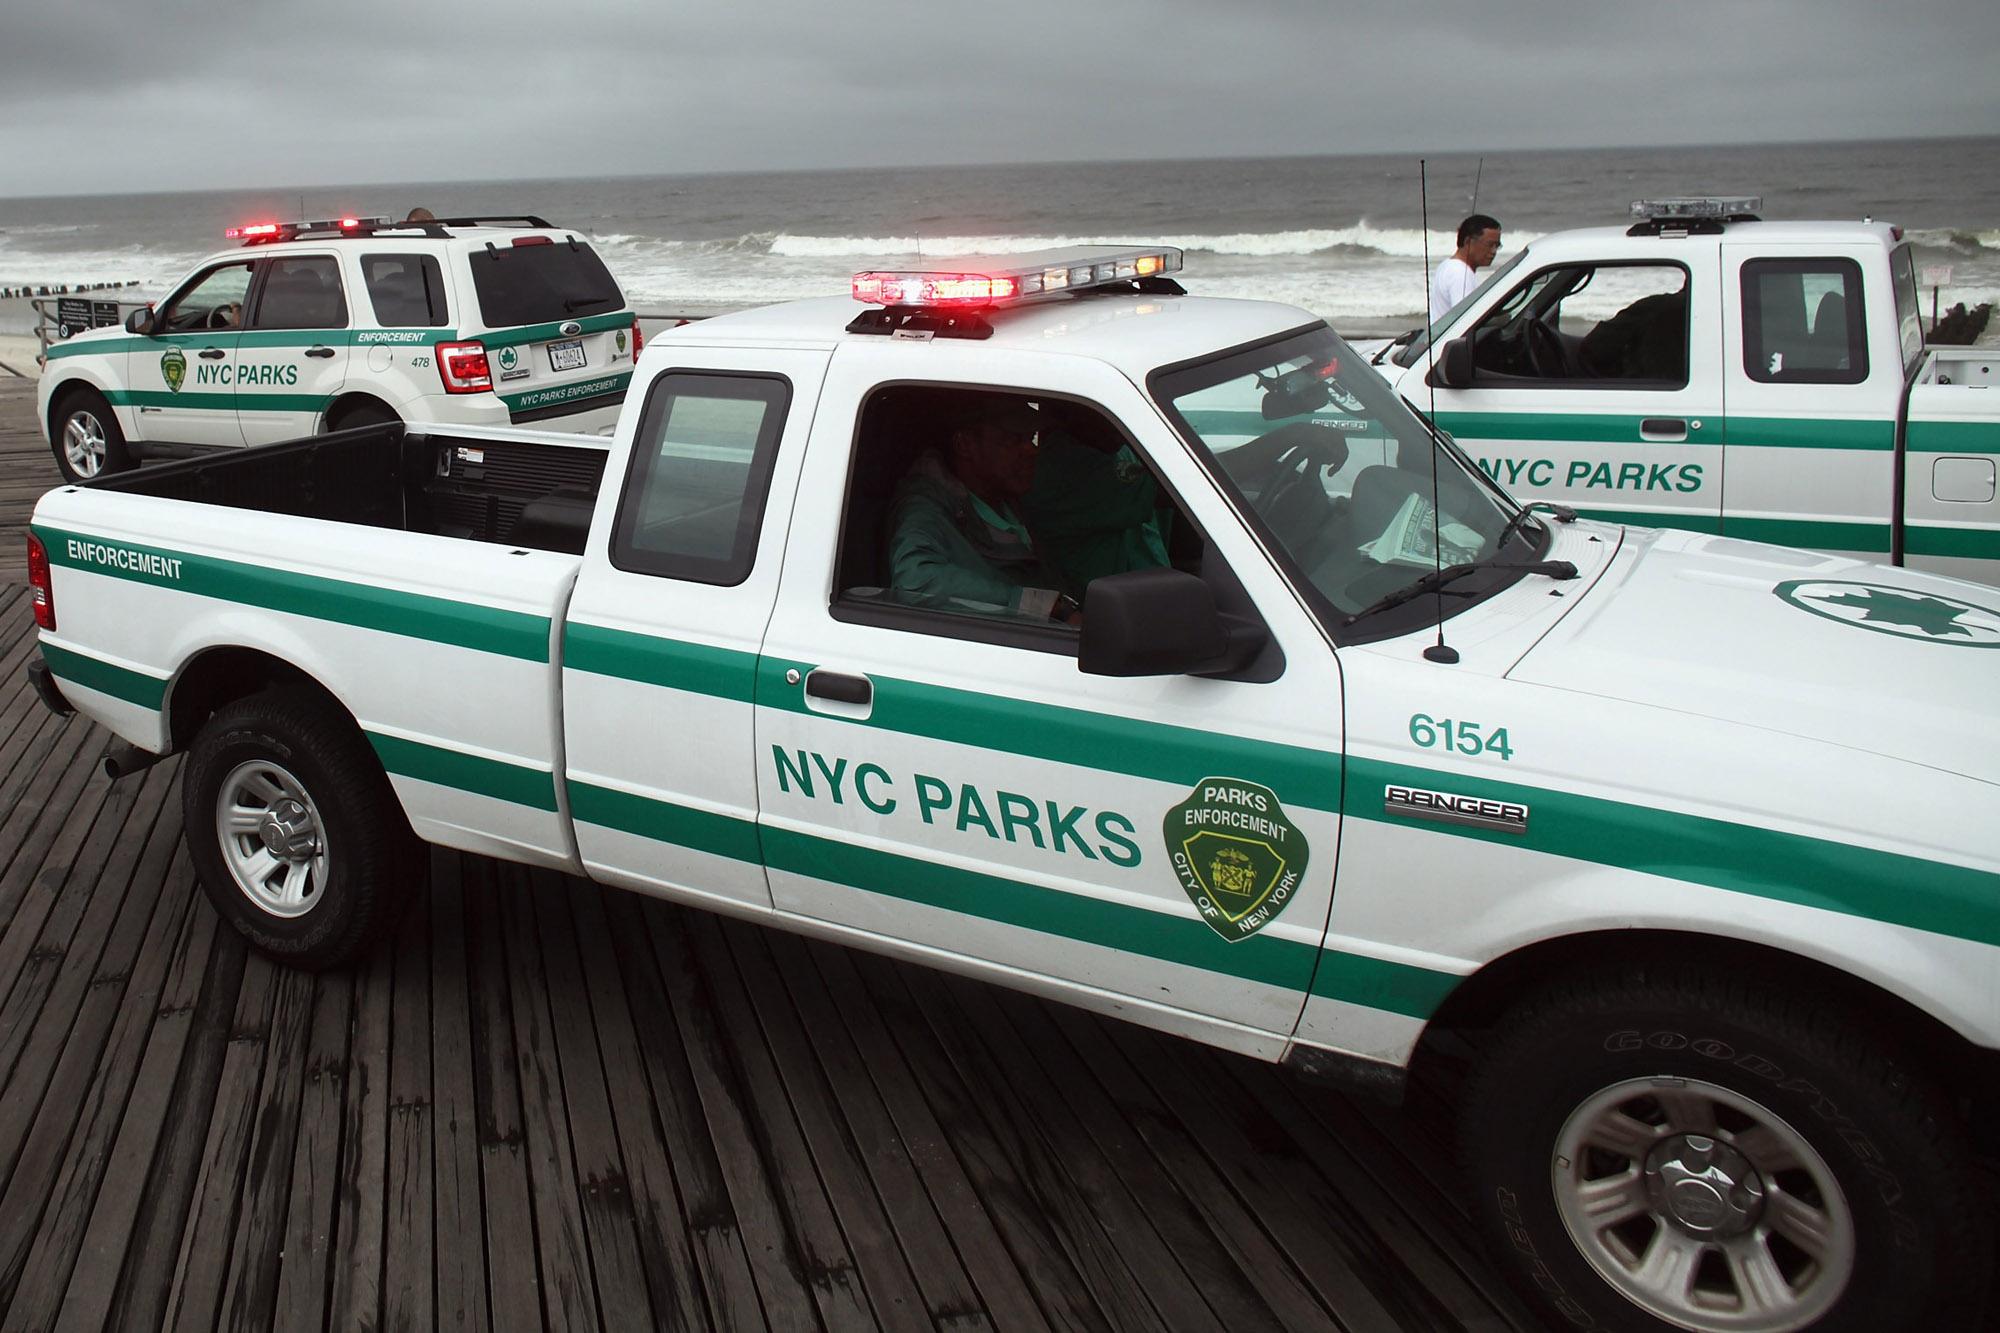 New York City Prepares For Direct Hit By Hurricane Irene